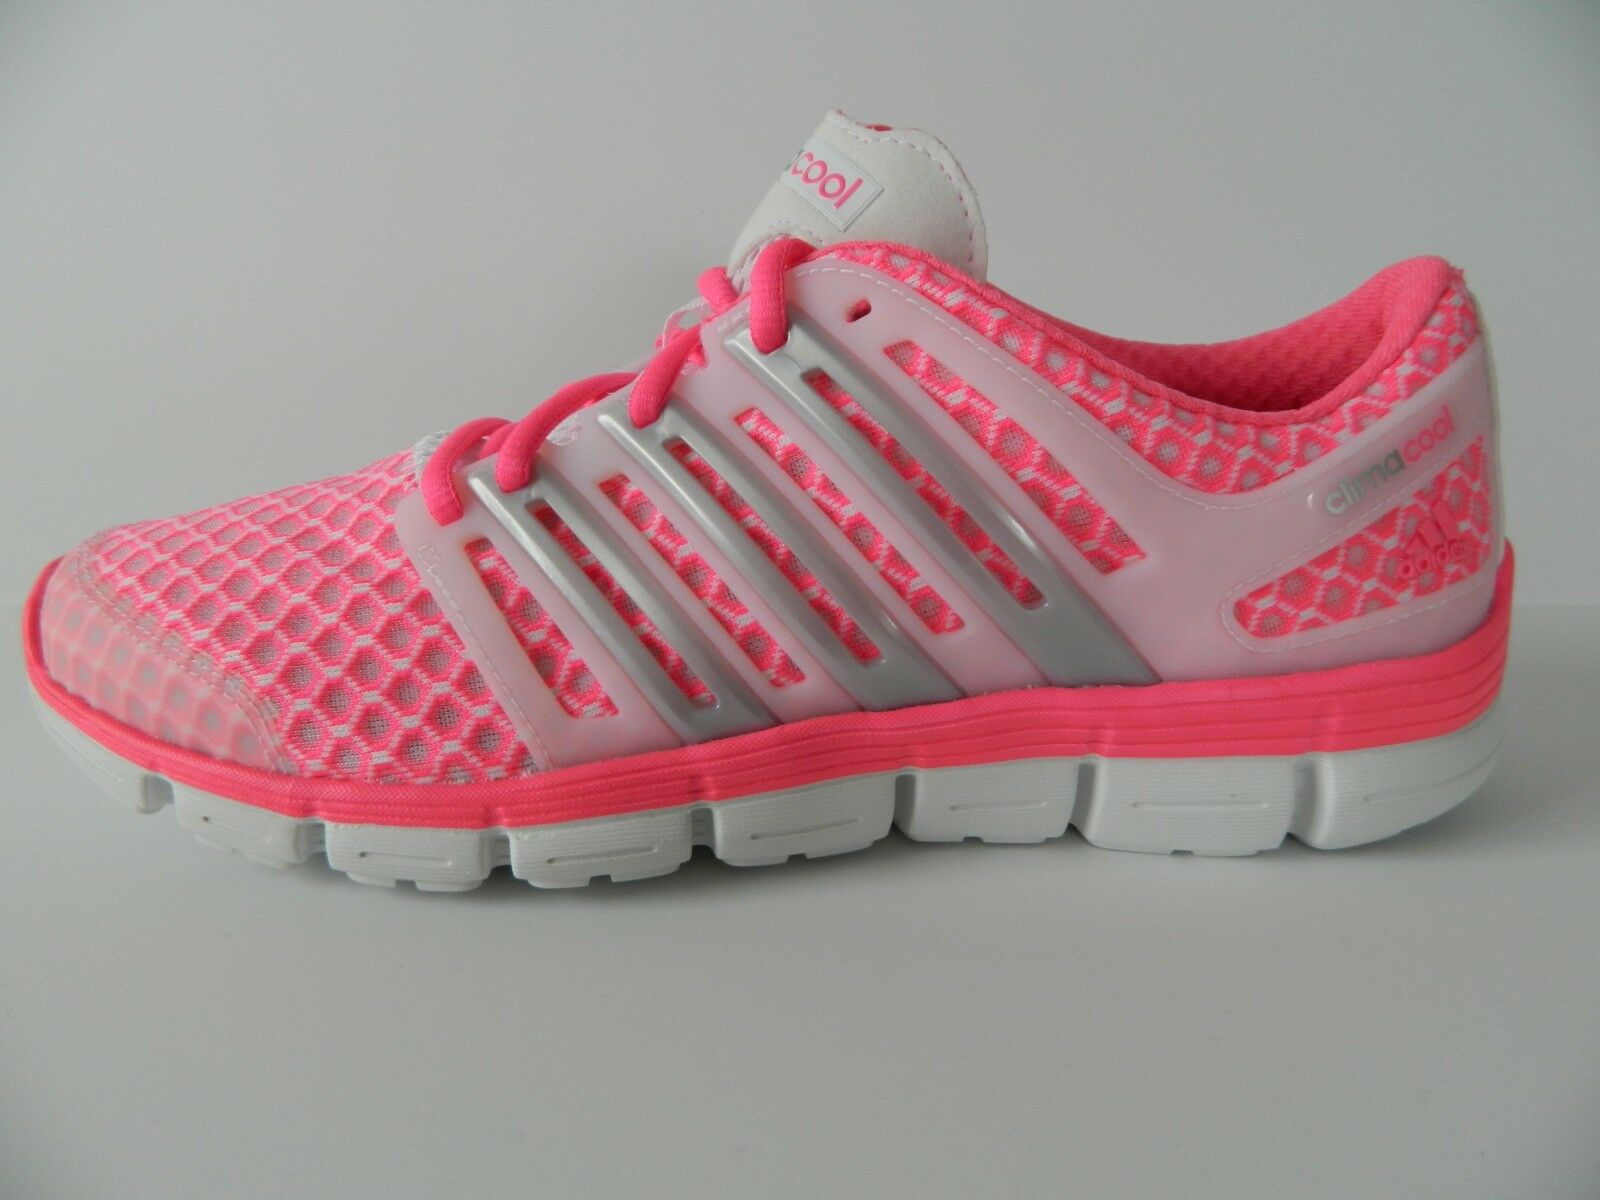 Adidas CC Crazy (Women's) ( Pink / White ) ( M25989 ) NIB